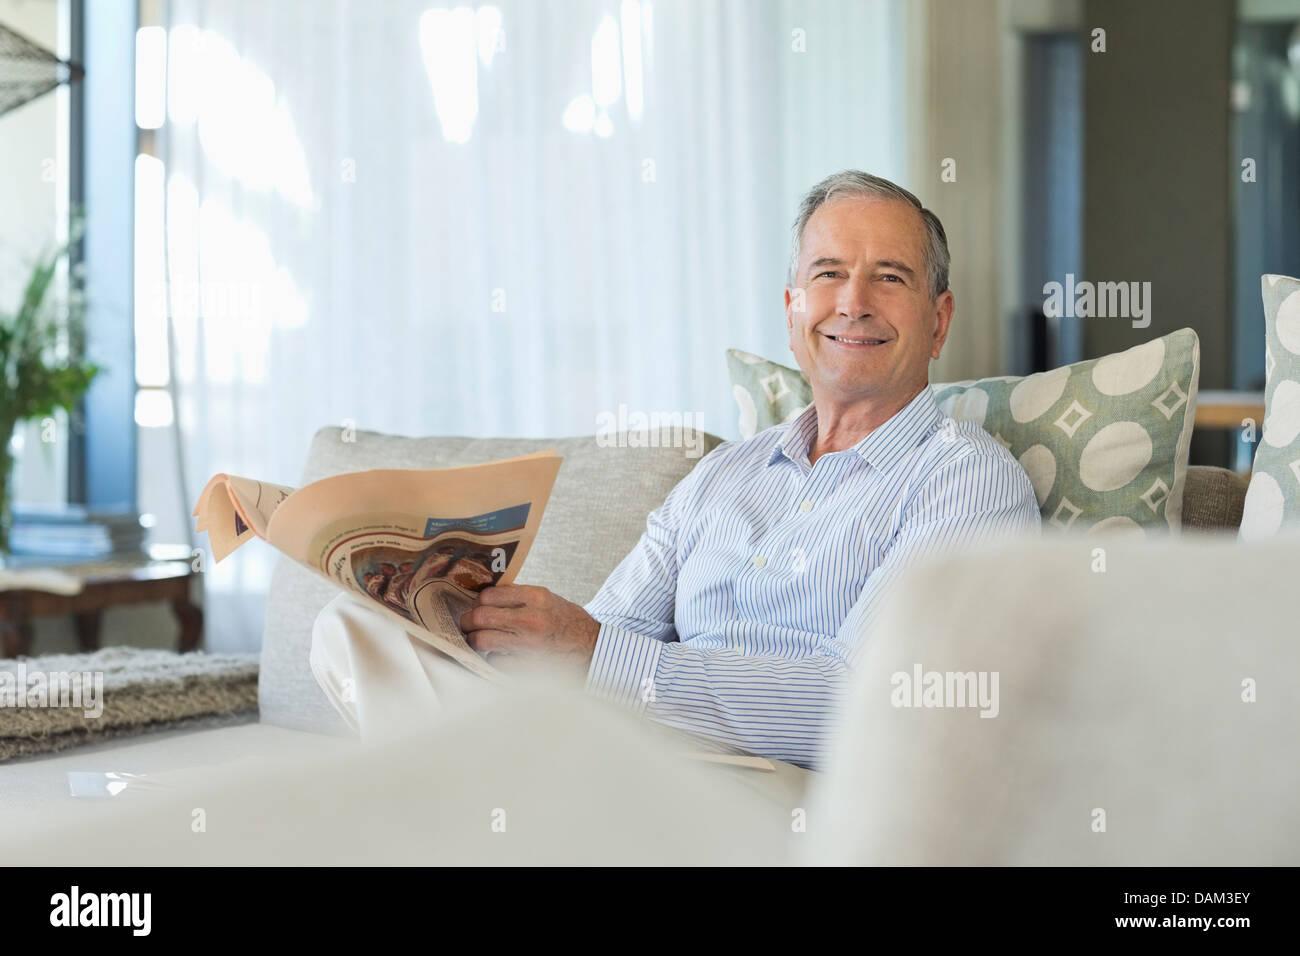 Older man reading newspaper on sofa - Stock Image